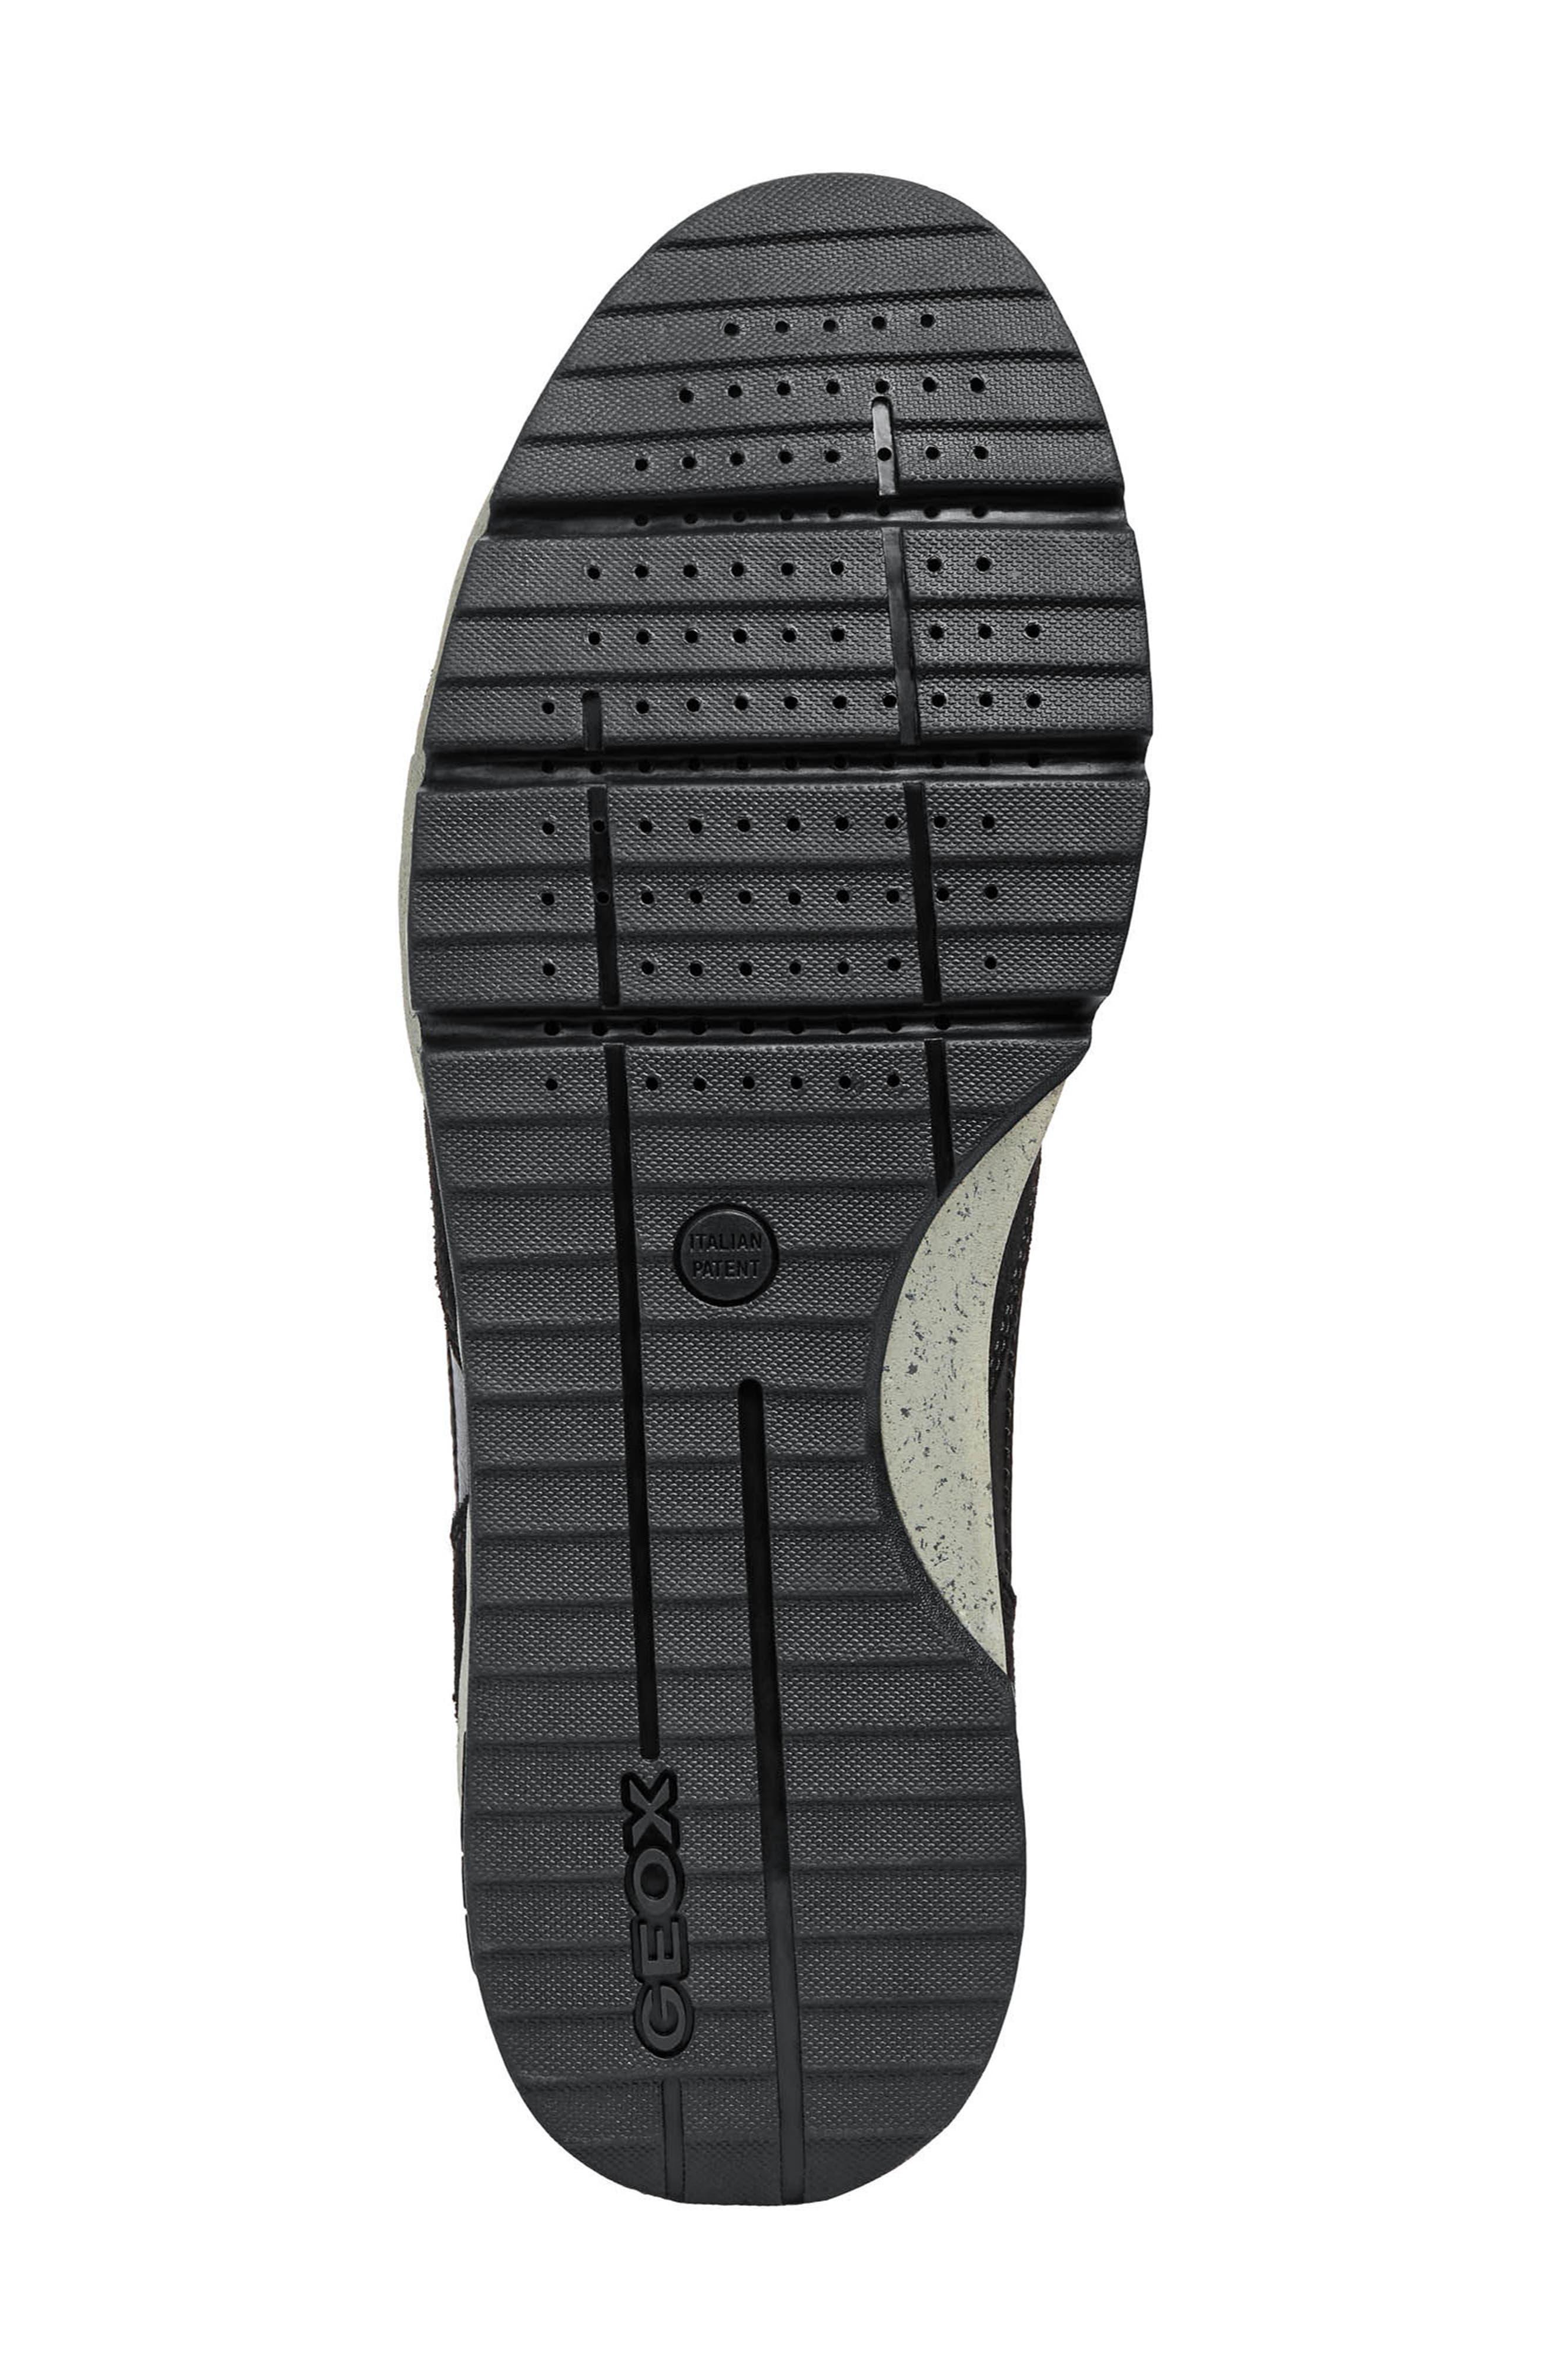 Sandro ABX Ambphibiox Waterproof Sneaker,                             Alternate thumbnail 6, color,                             007